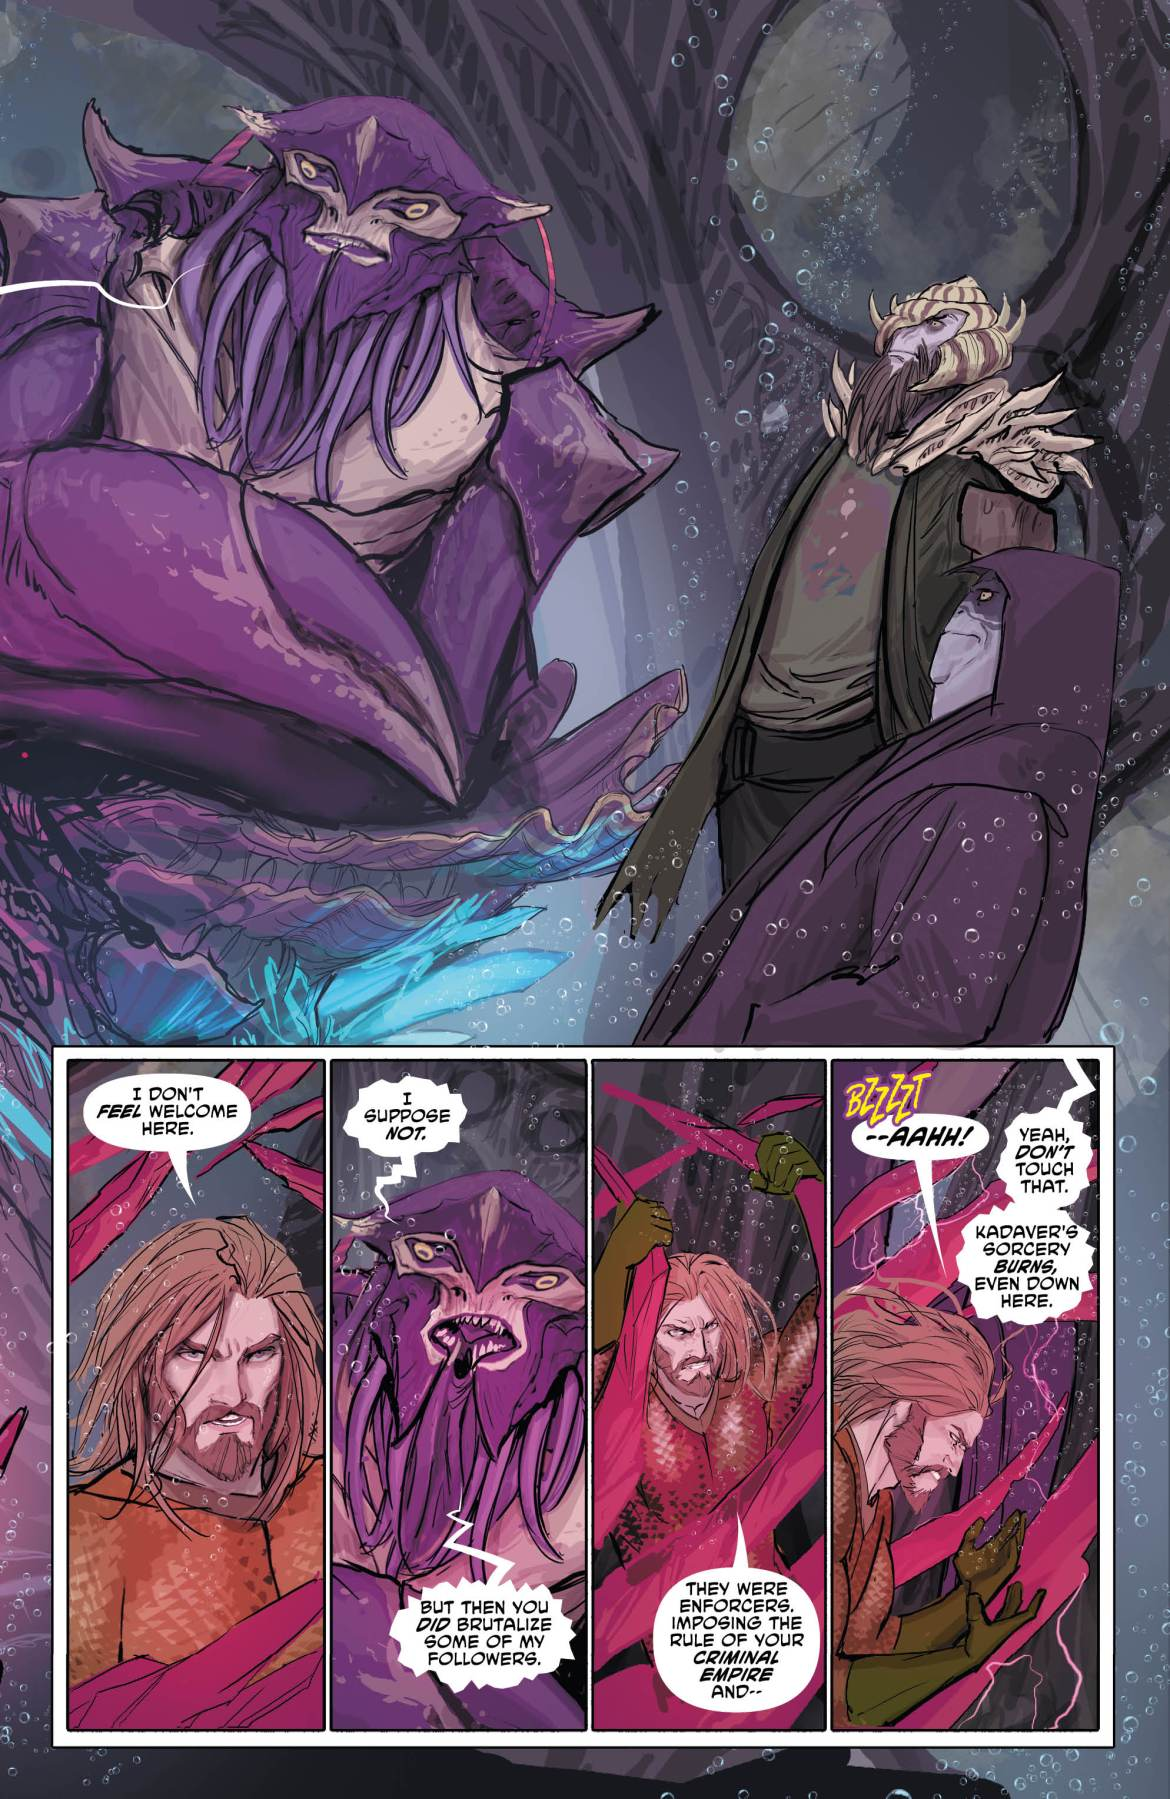 Aquaman Page 3 - DC Comics News